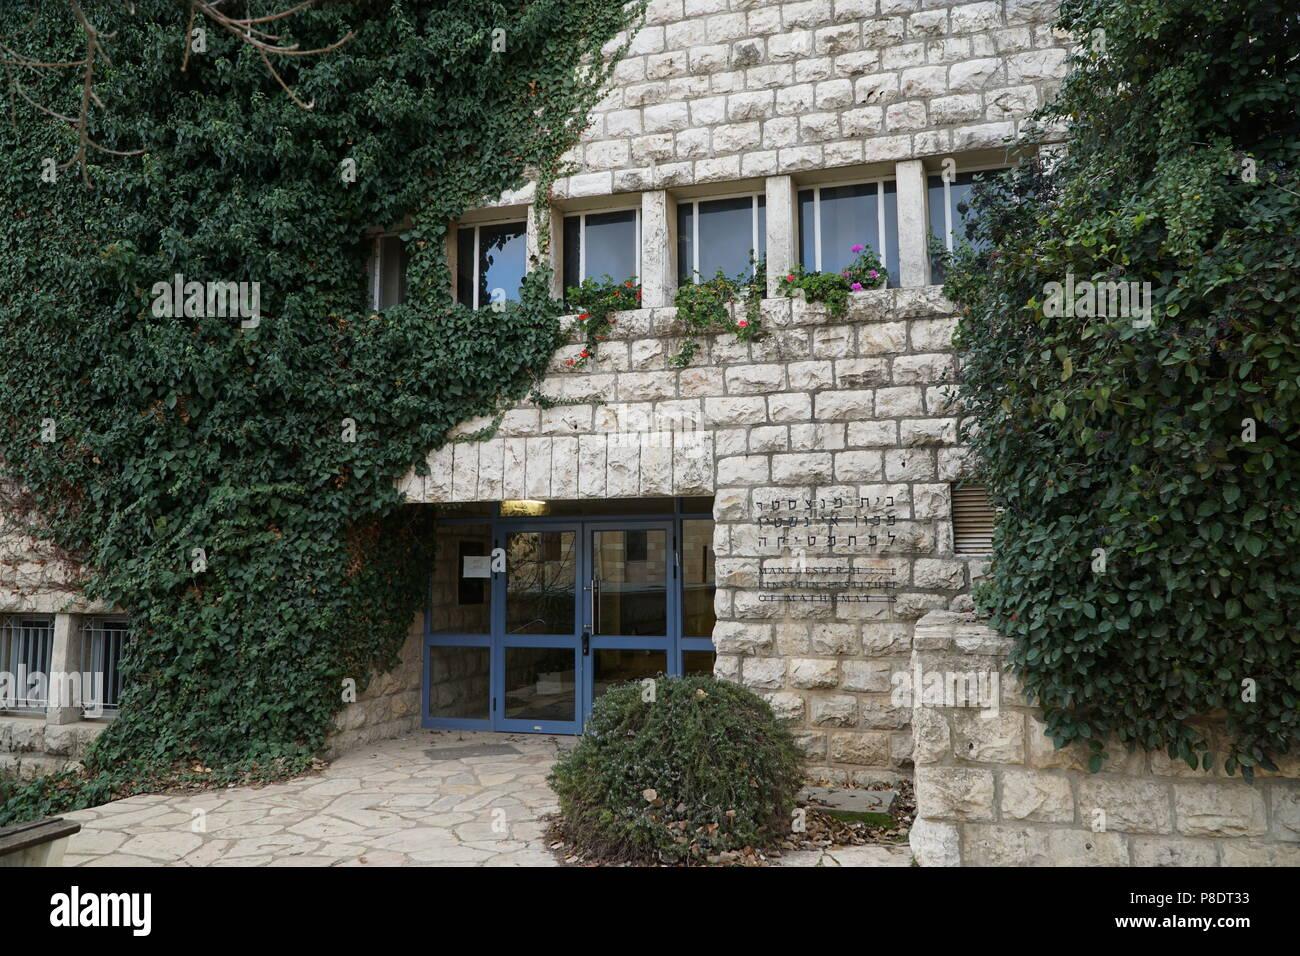 Hebrew University of Jerusalem, Givat Ram Campus - Stock Image